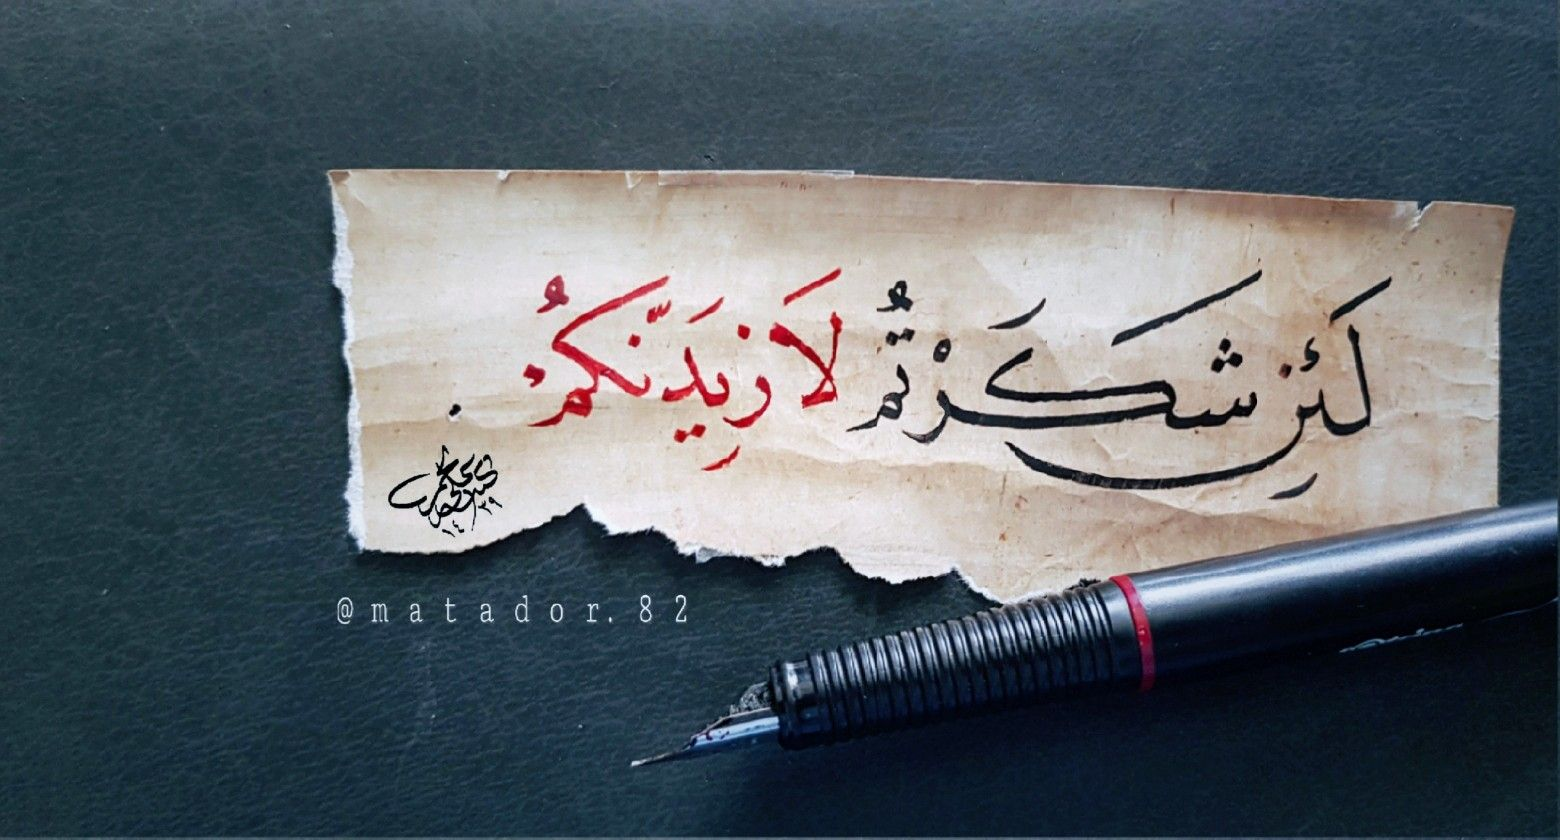 لئن شكرتم لازيدنكم خواطر العراق خط عربي رمضان كريم Fb Timeline Cover Calligraphy I Qoutes